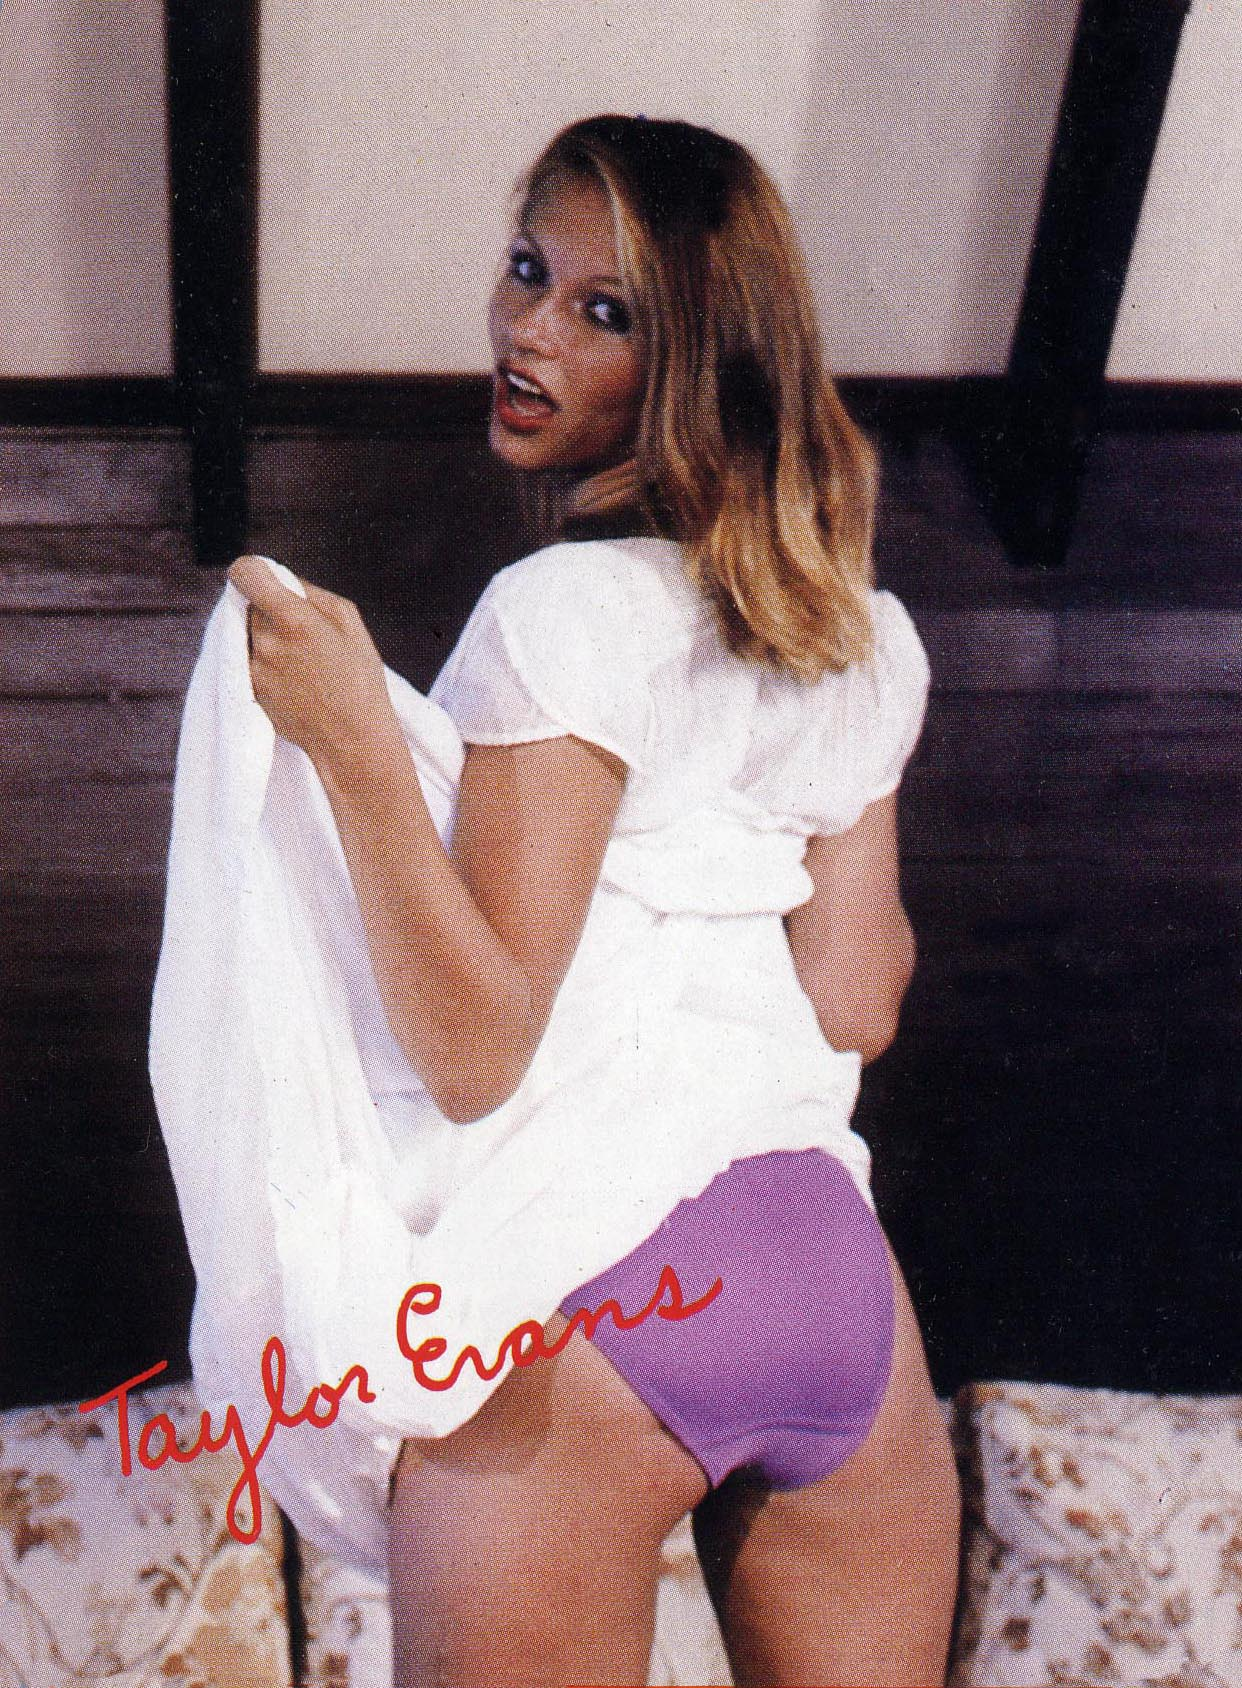 01 Ashley Welles aka Taylor Evans Showgirl 15.jpg